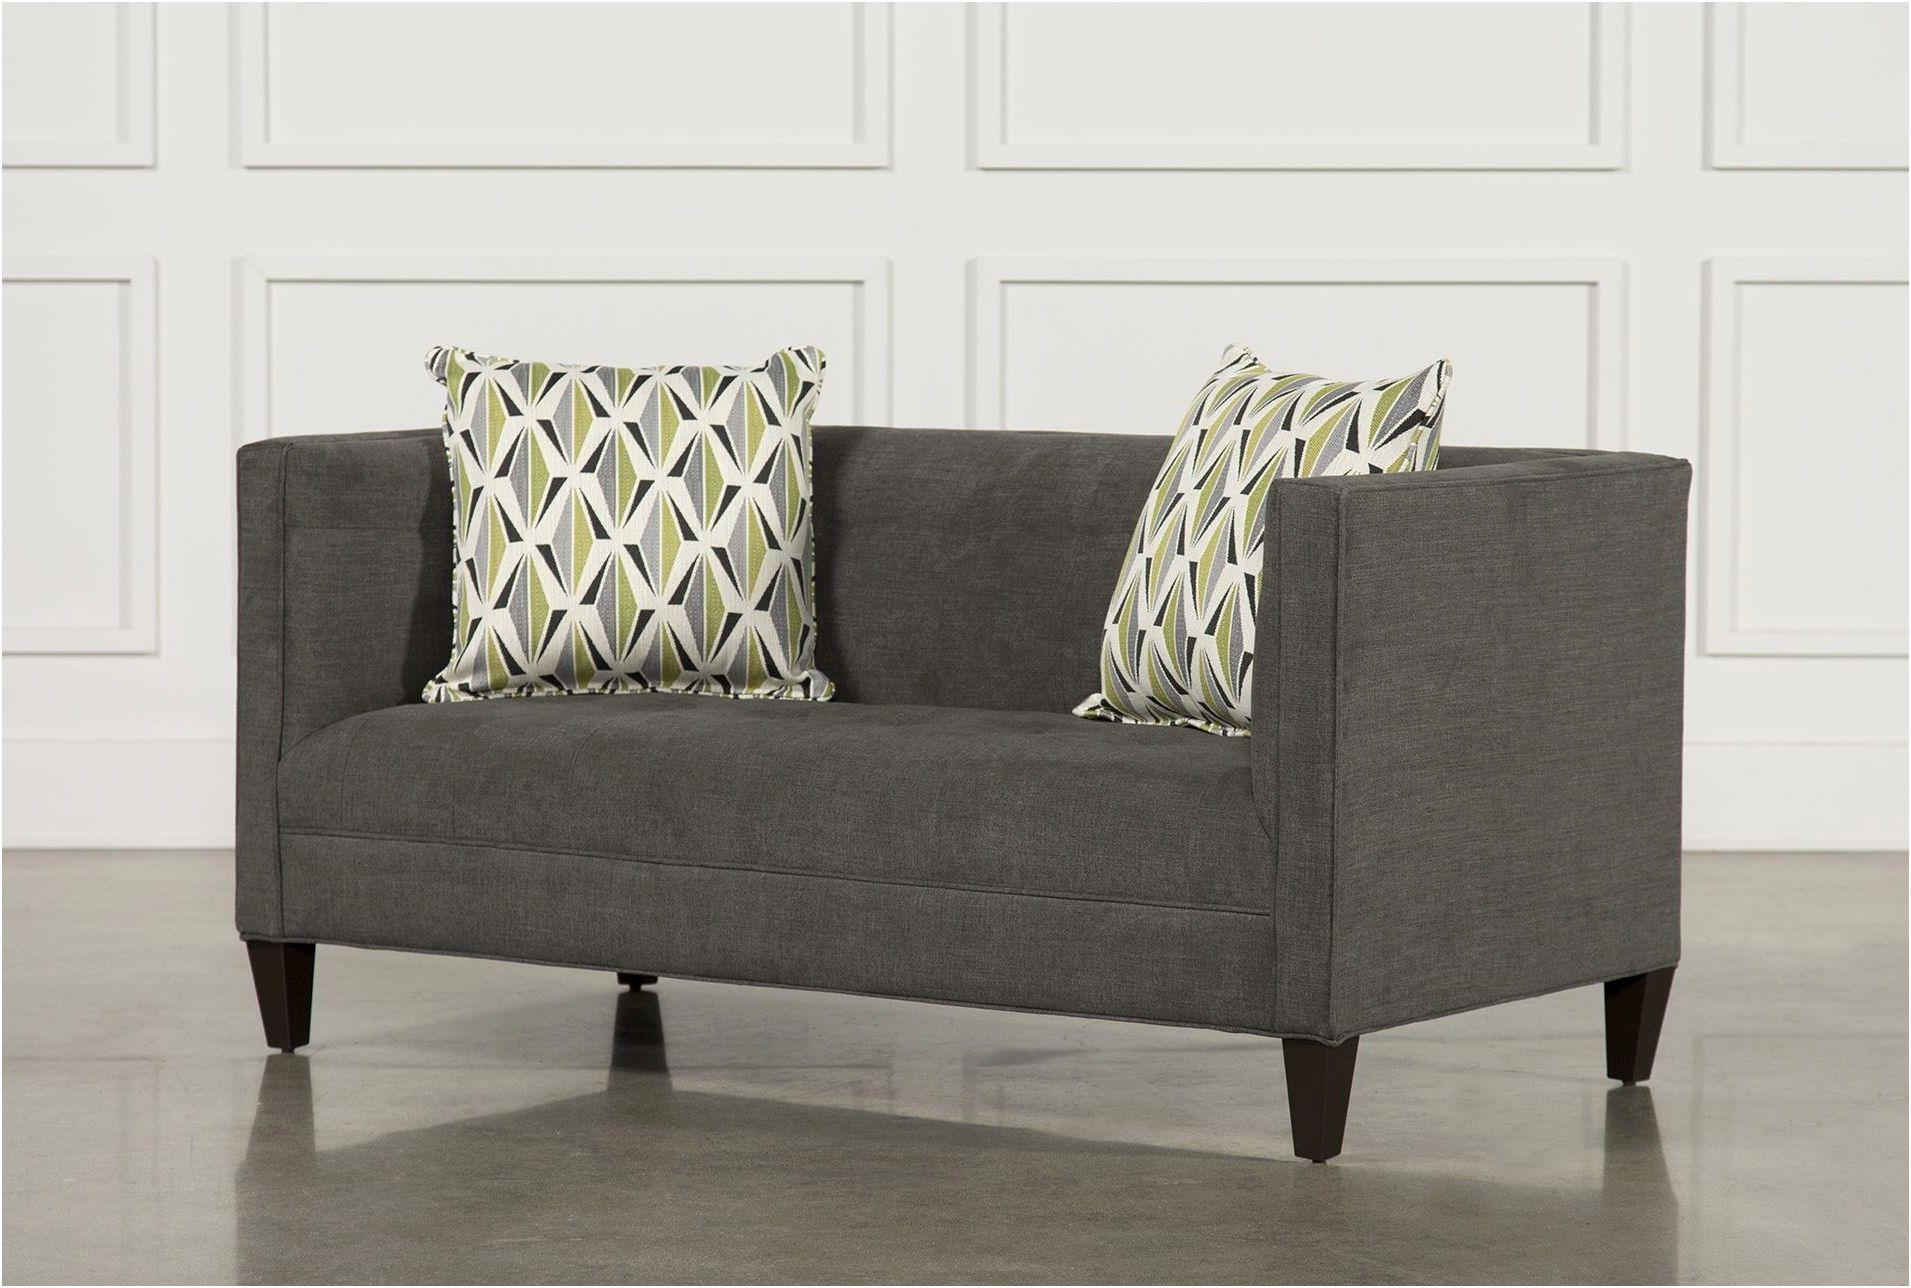 Inspirational Cindy Crawford Sleeper Sofa Image Cindy Crawford Sleeper Sofa  Luxury Rooms To Go Replacement Slipcovers